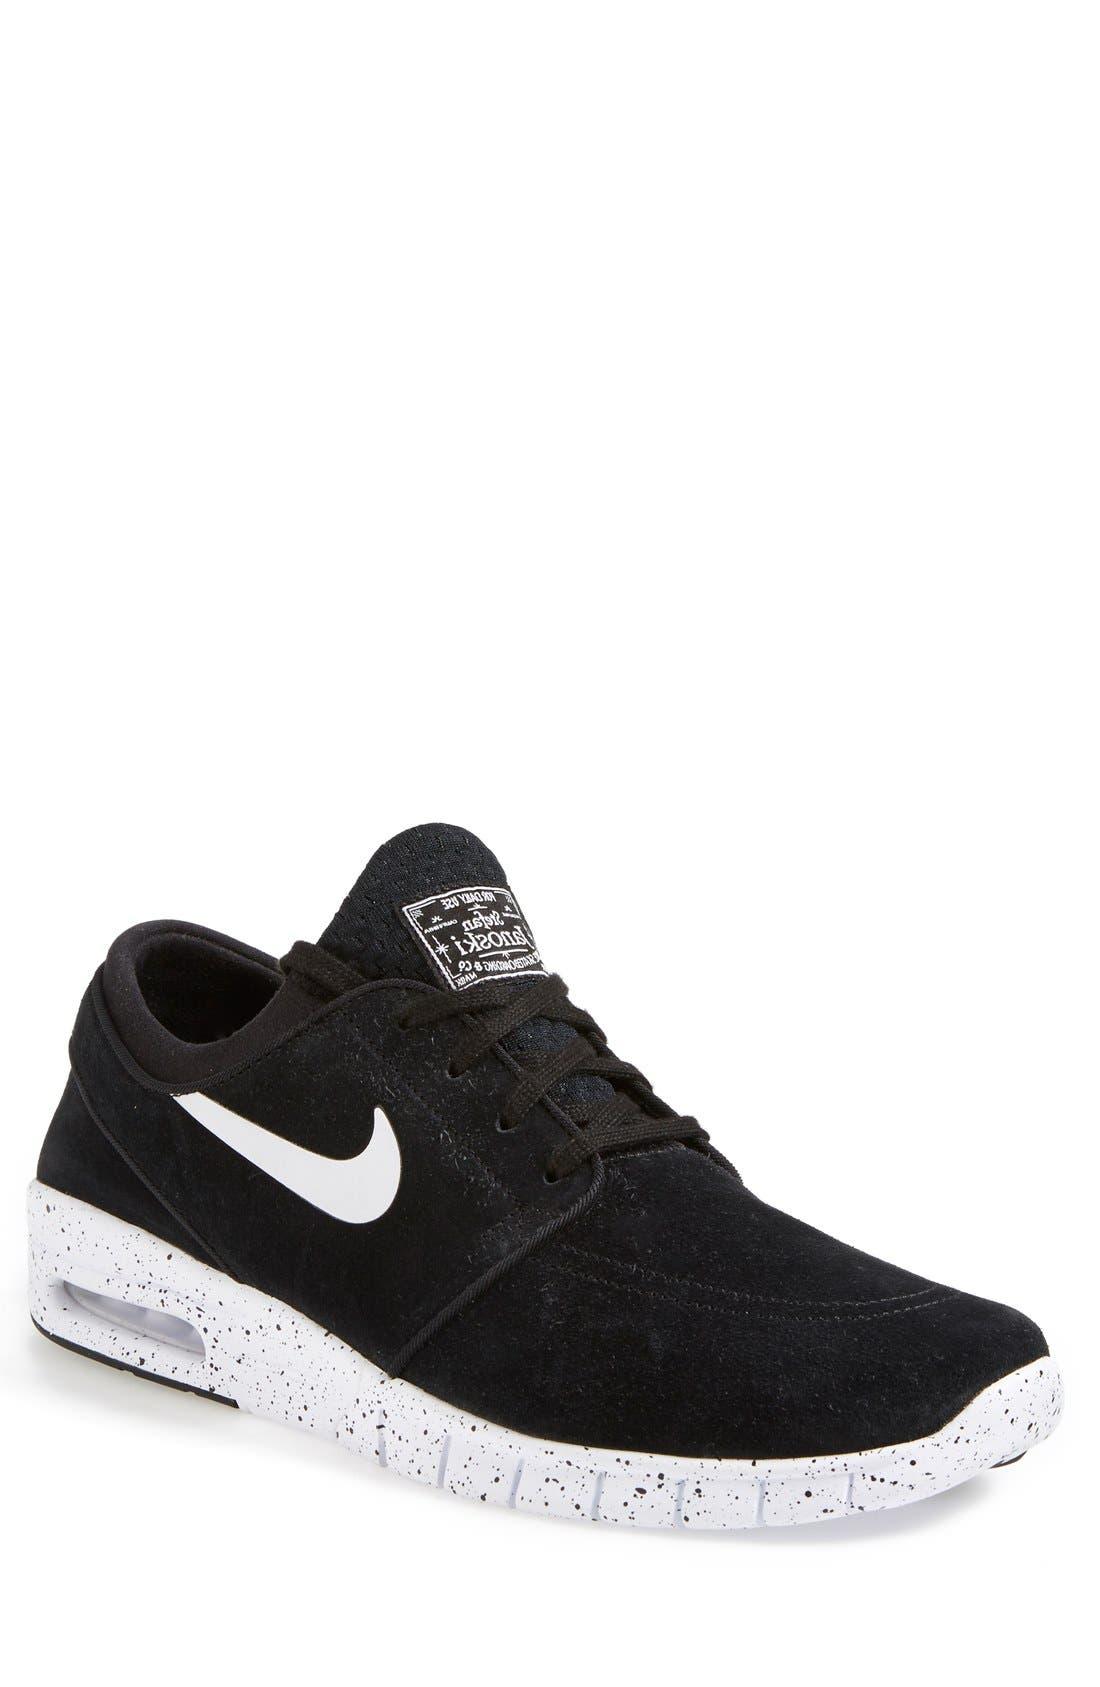 Alternate Image 1 Selected - Nike 'Stefan Janoski Max SB' Skate Sneaker (Men)